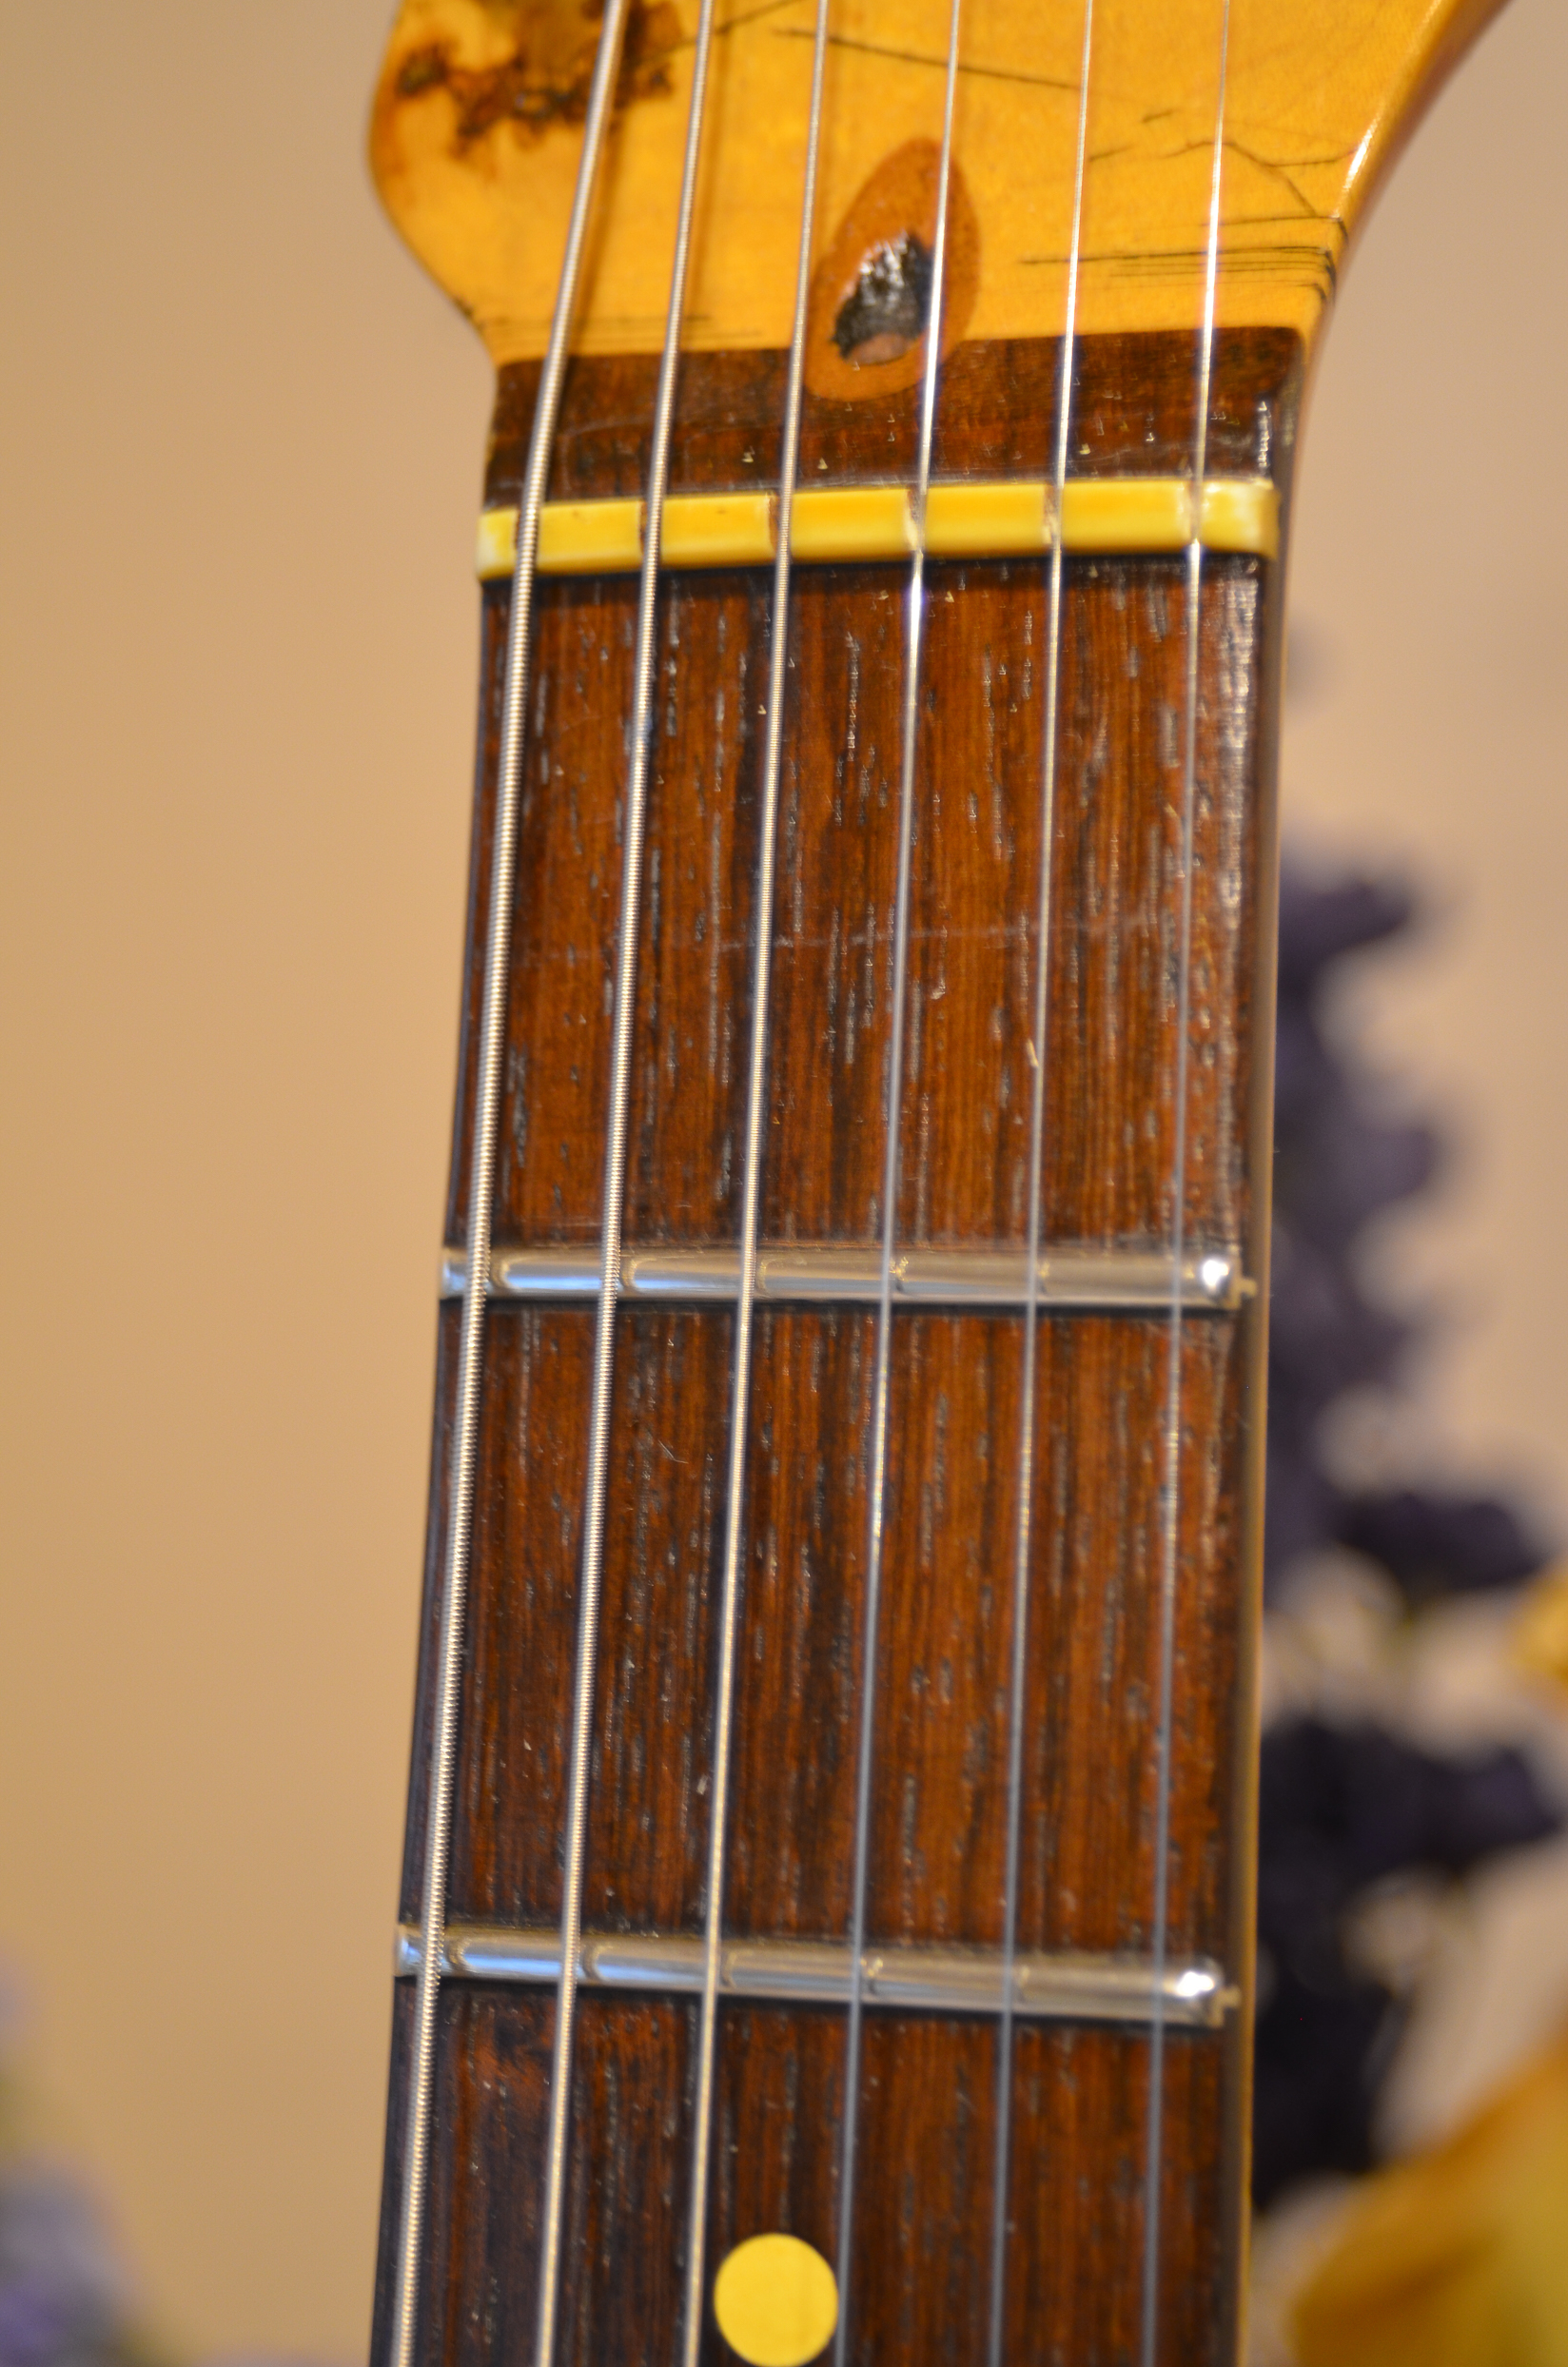 Fender Stratocaster Rosewood Neck Frets Guitarwacky.com